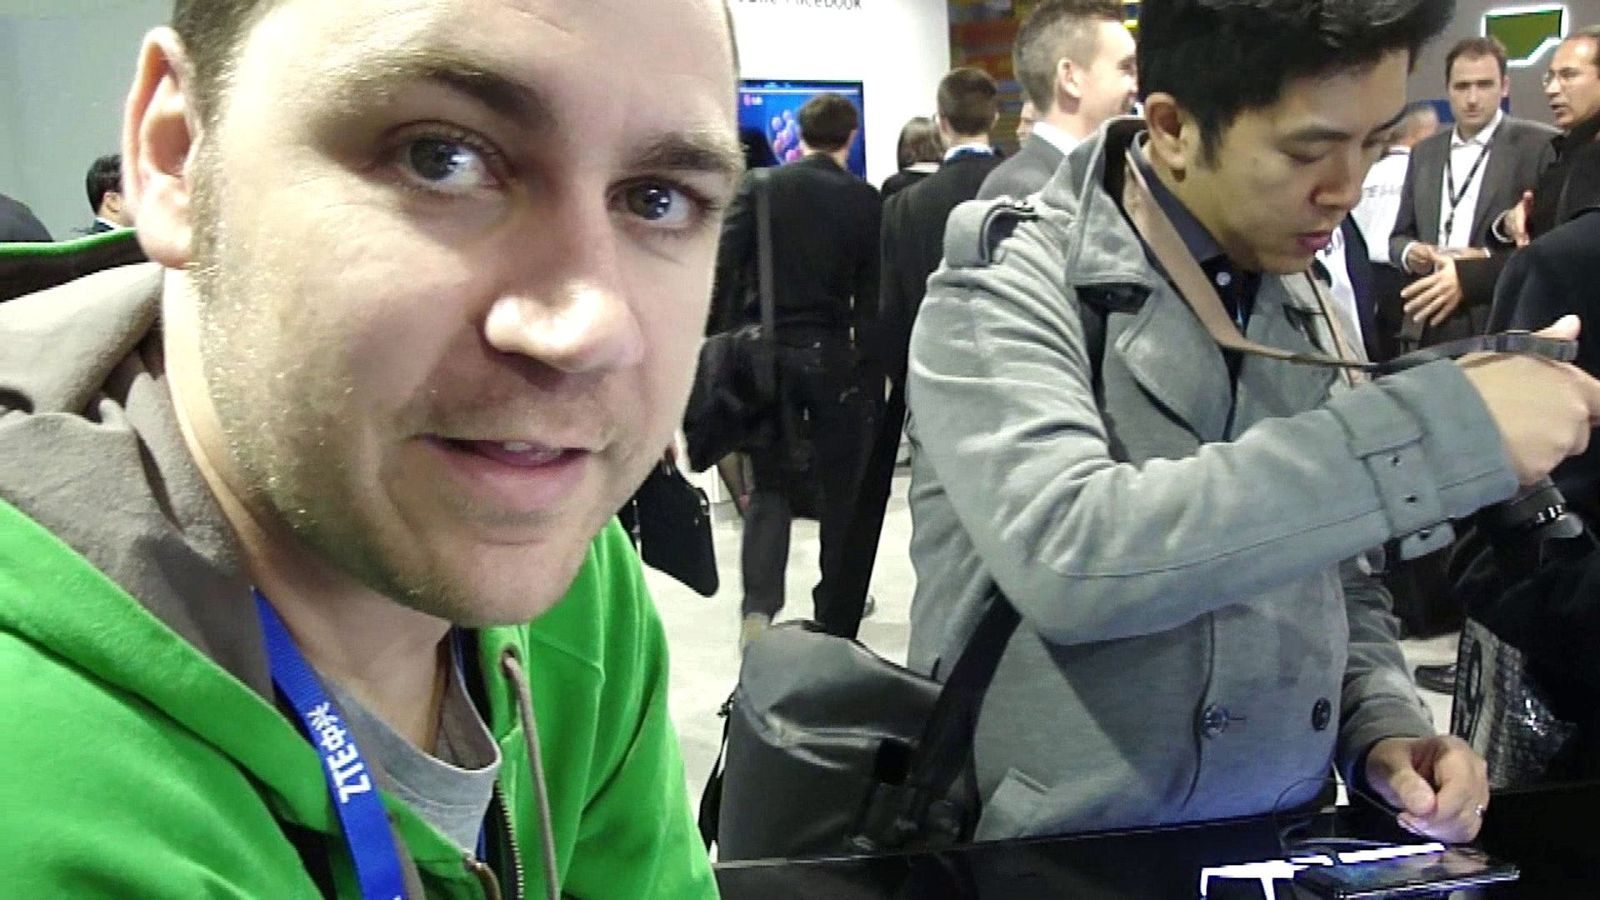 [MWC 2012] Vídeo: LG Optimus 3D Max